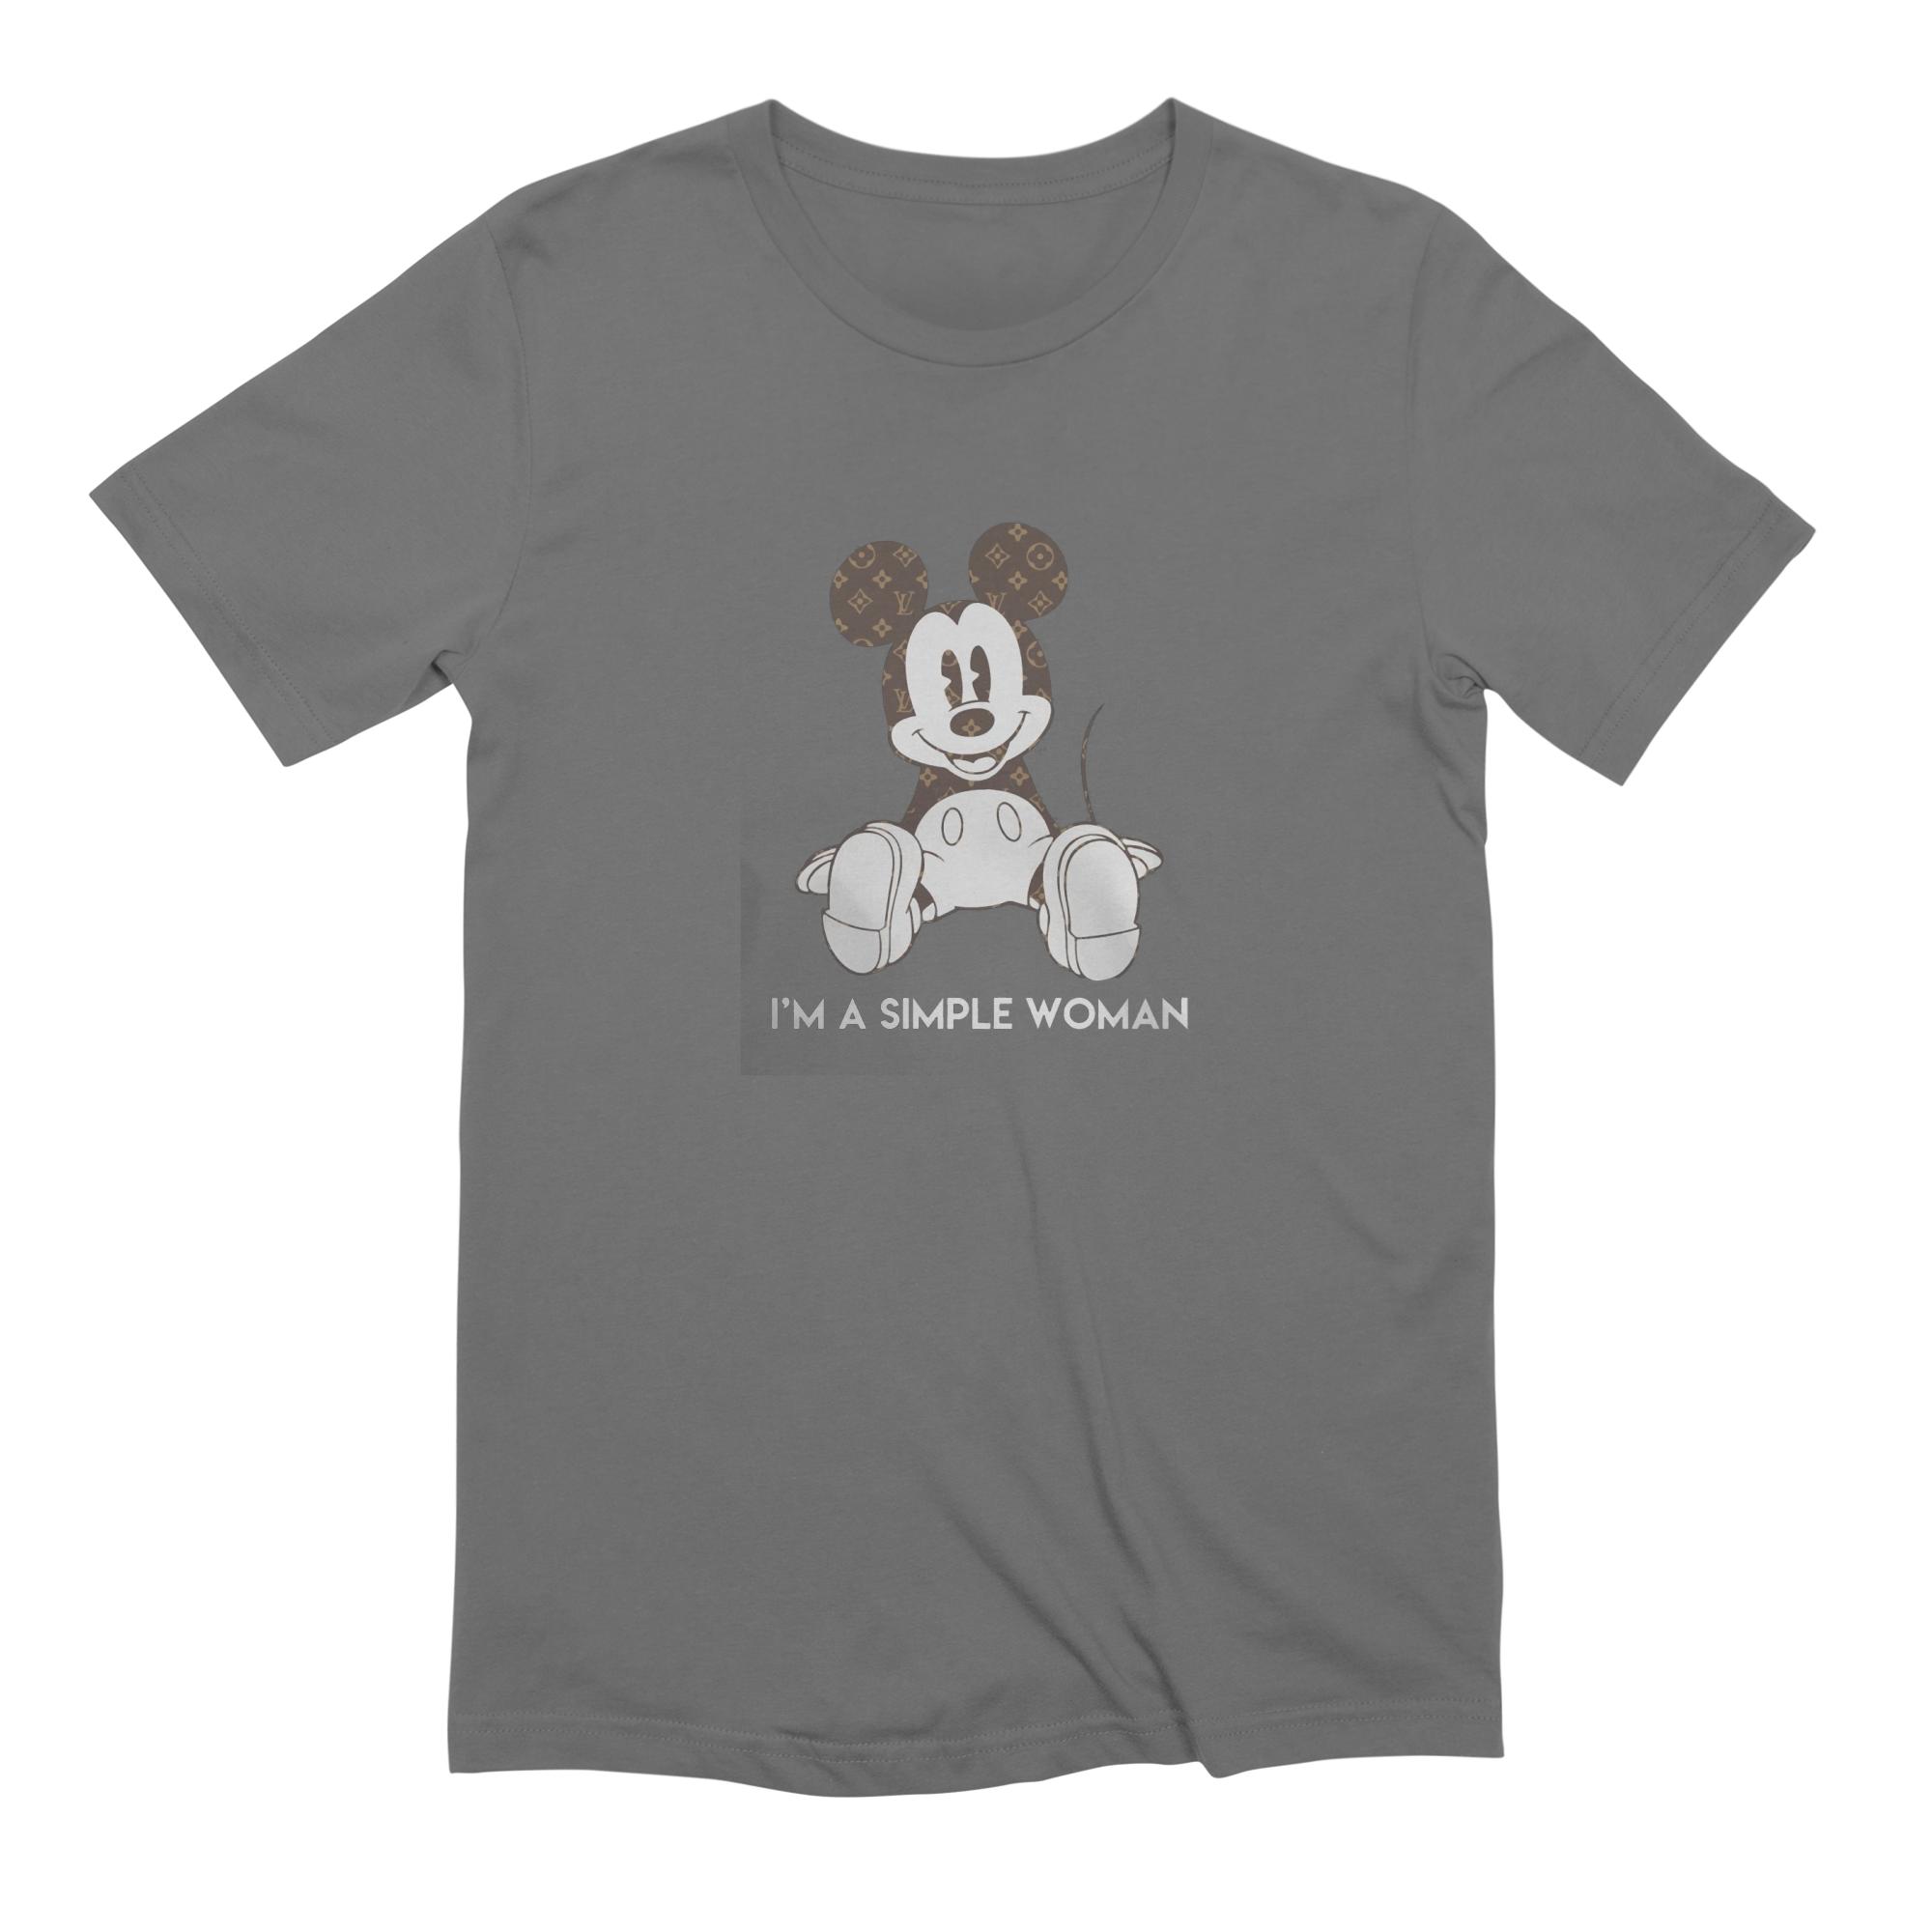 04c4dce1d3a2 molotee mickey-mouse-louis-vuitton-im-a-simple-women-shirt mens t-shirt